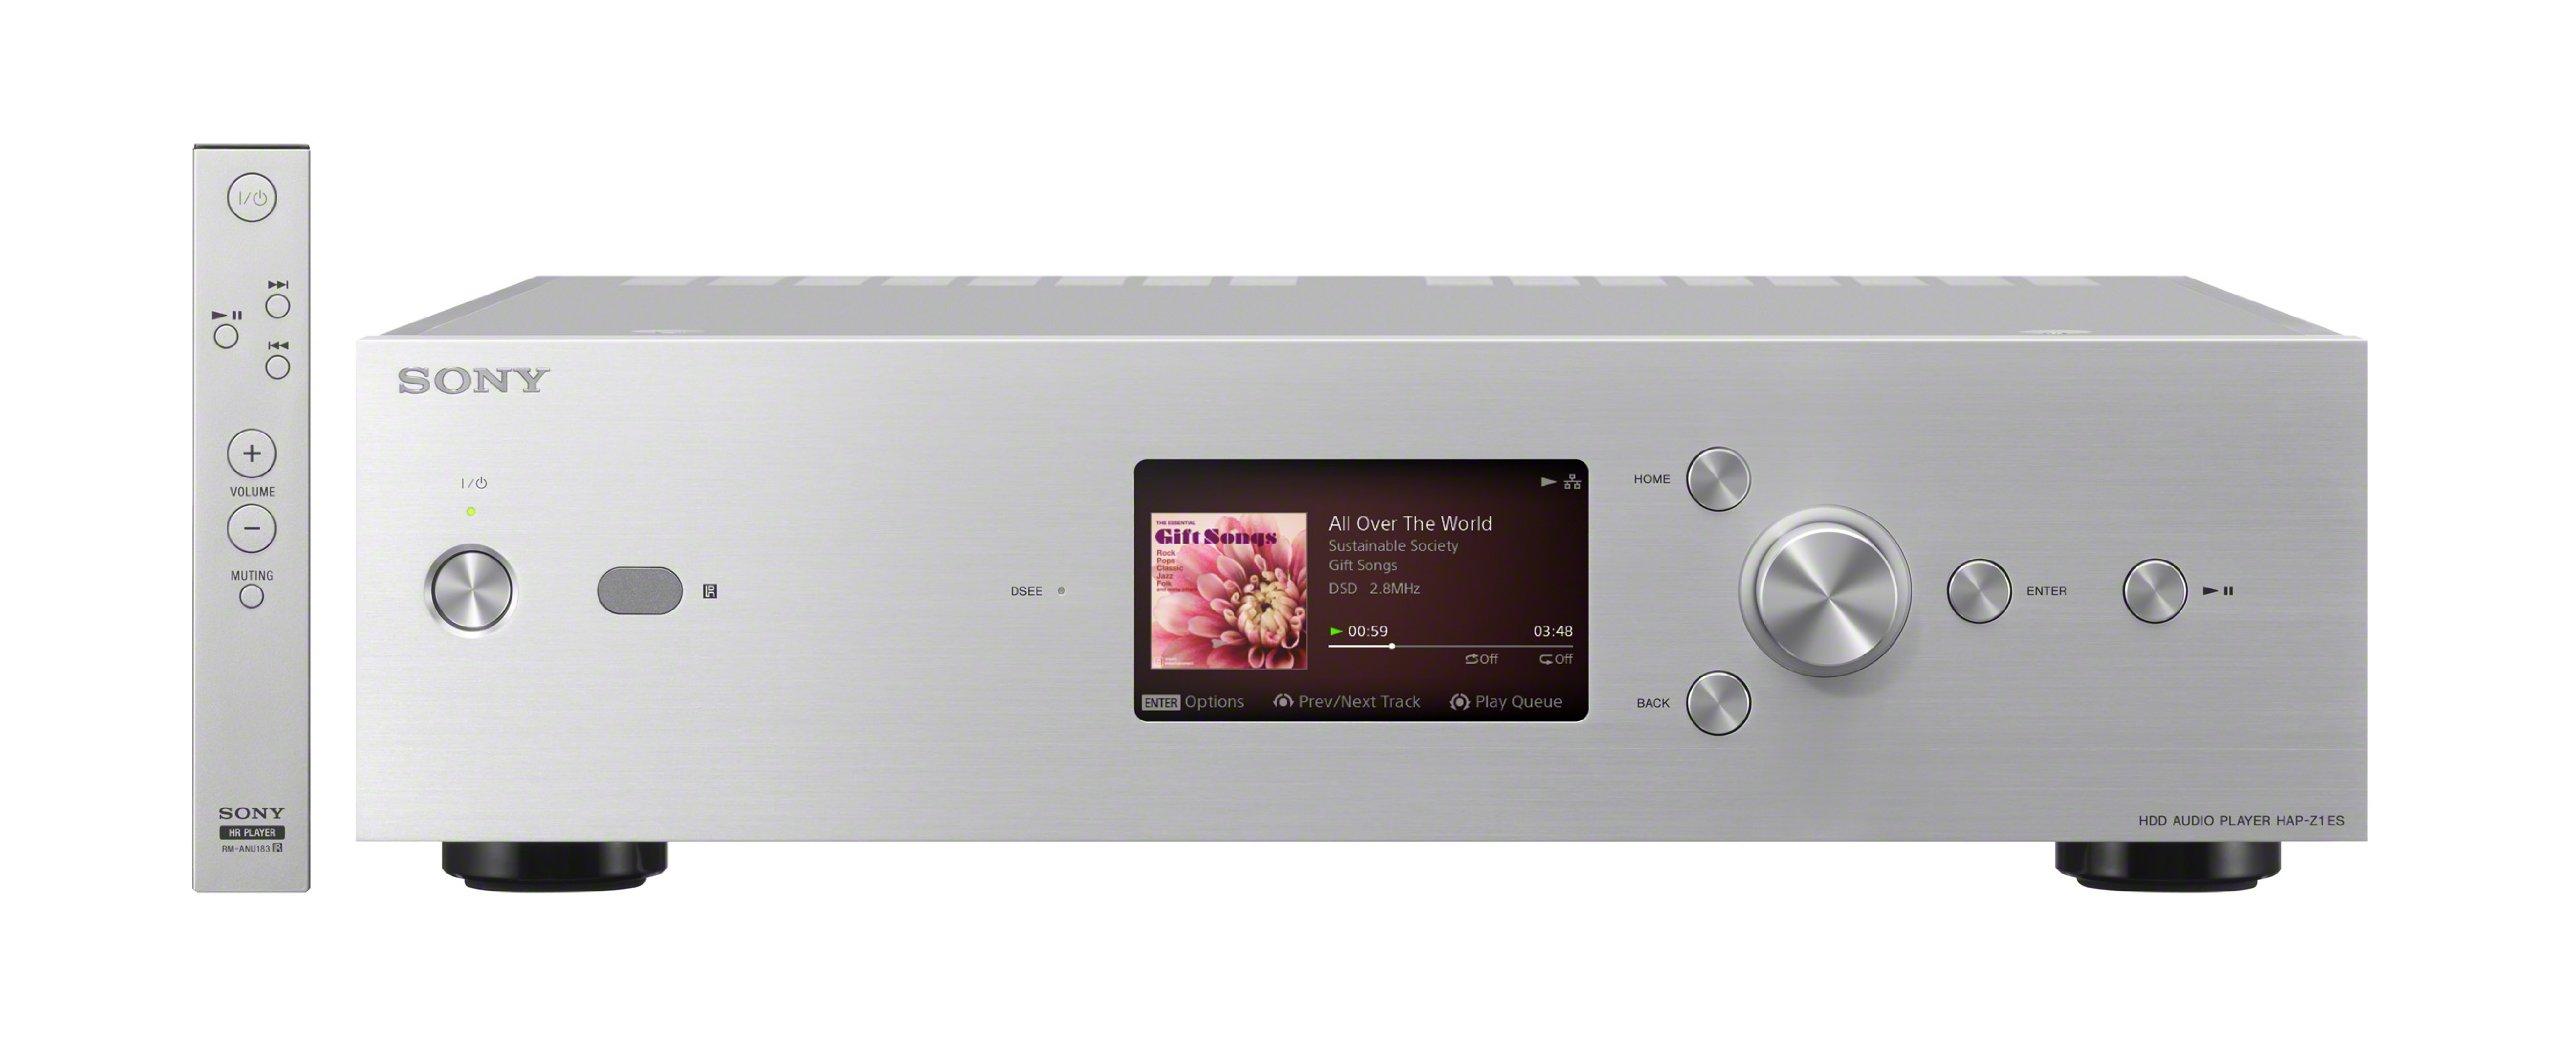 Sony HAPZ1ES 1TB Hi-Res Music Player System